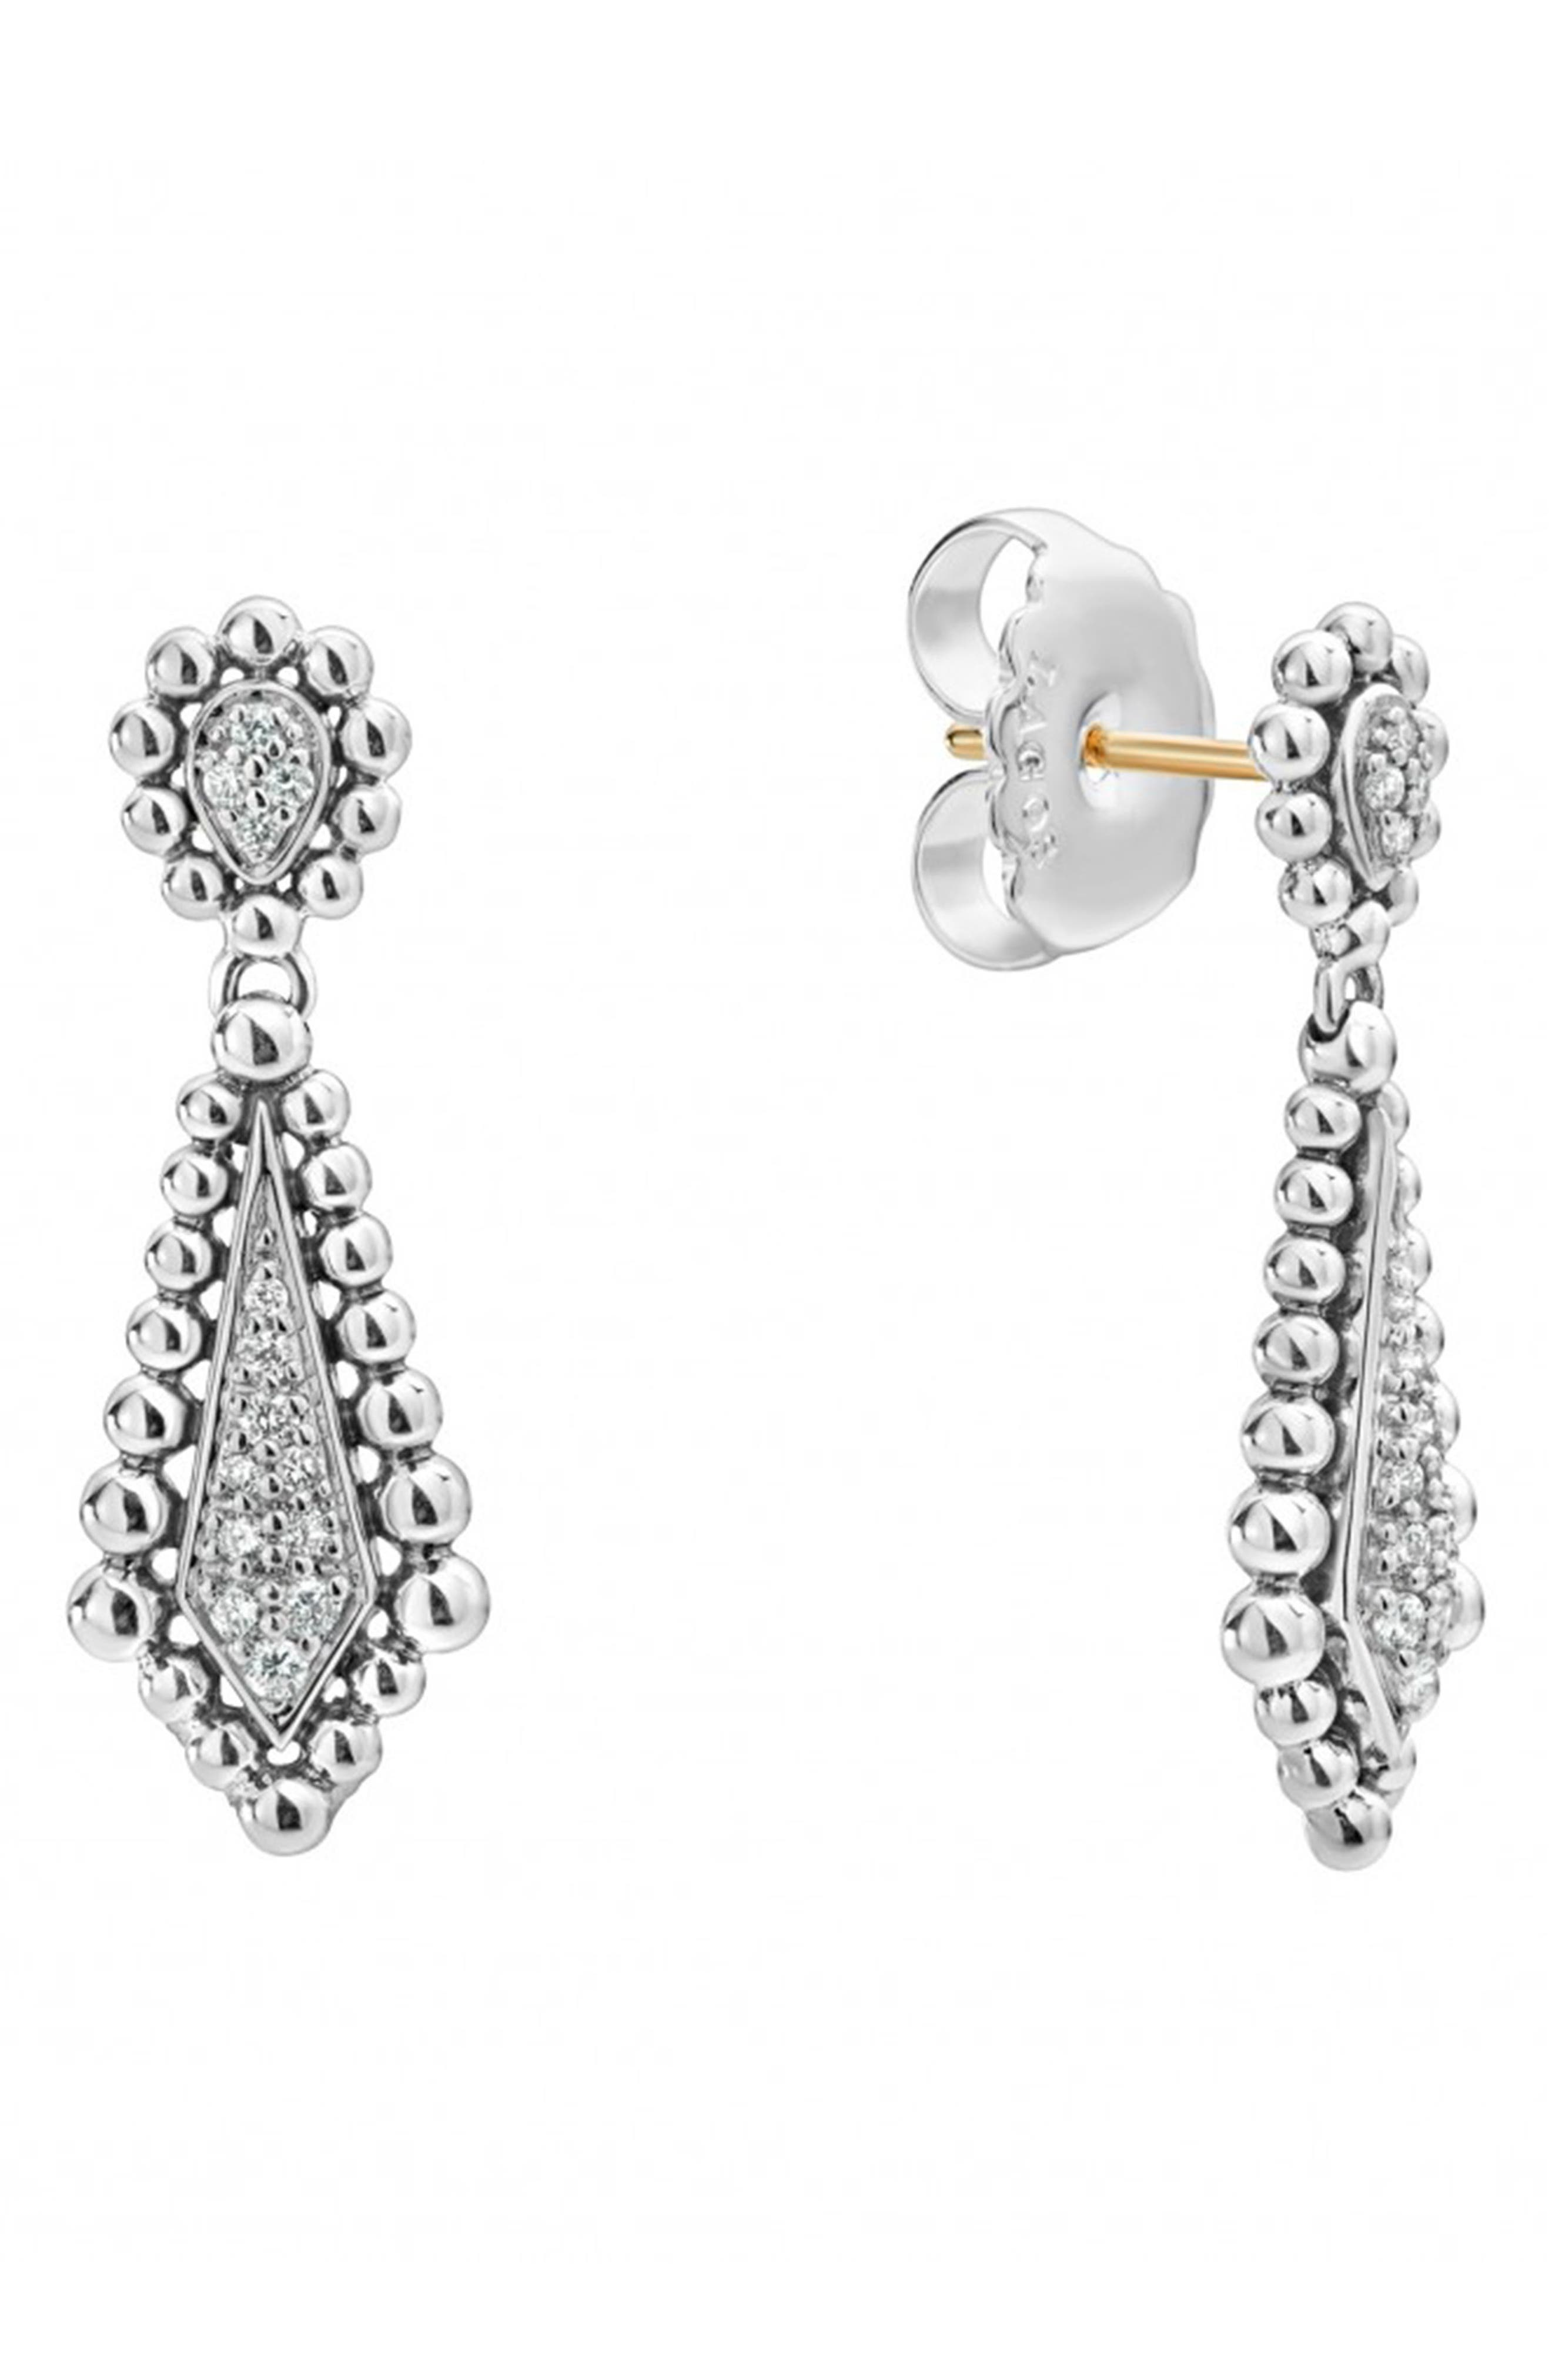 Caviar Spark Diamond Earrings,                             Alternate thumbnail 2, color,                             Diamond